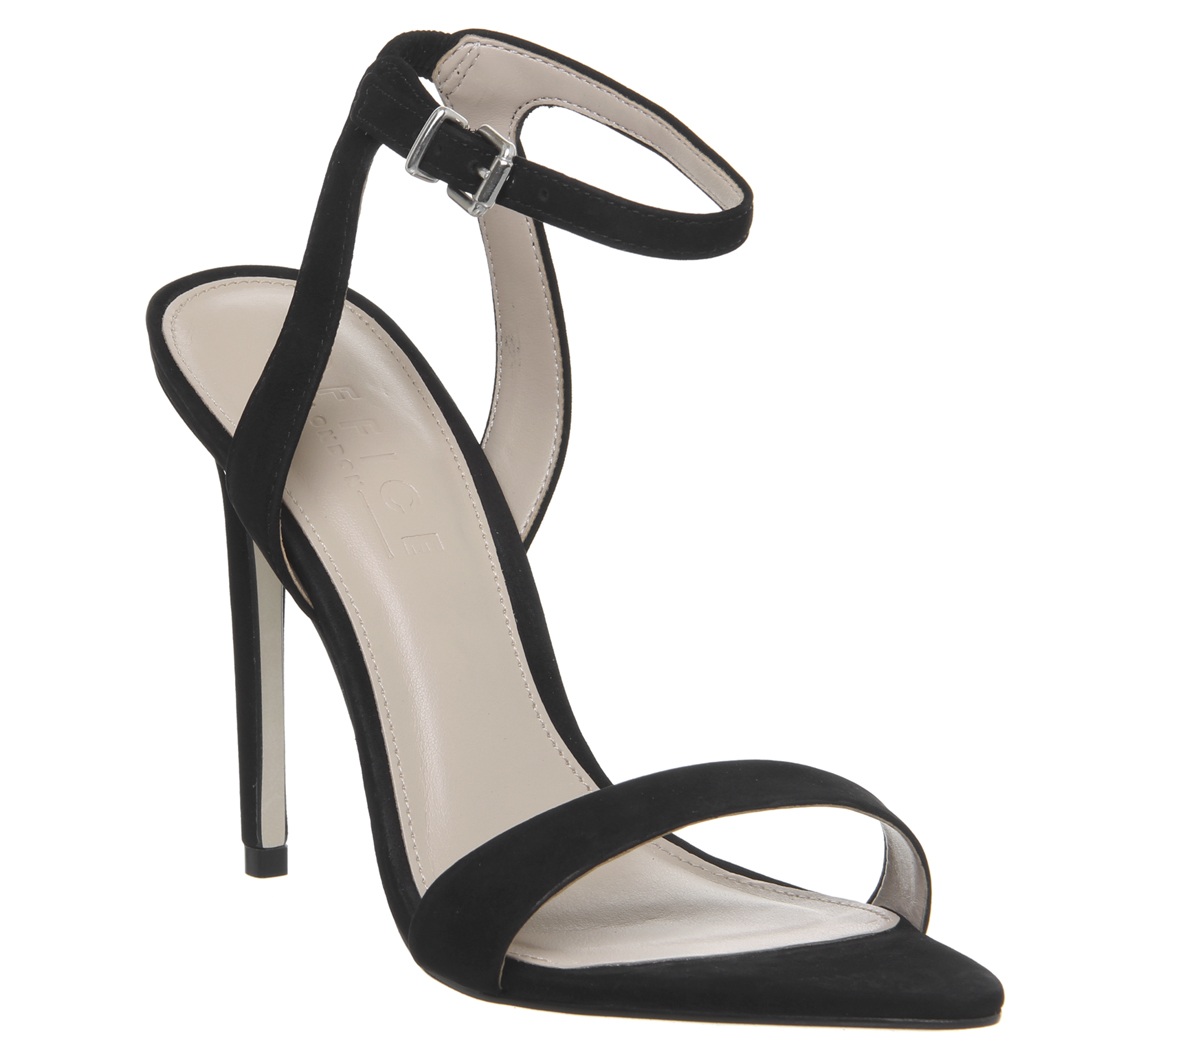 ad11e9b9cd7 Womens Office Hemlock Two Part Pointed Sandal Heels Black Nubuck Heels